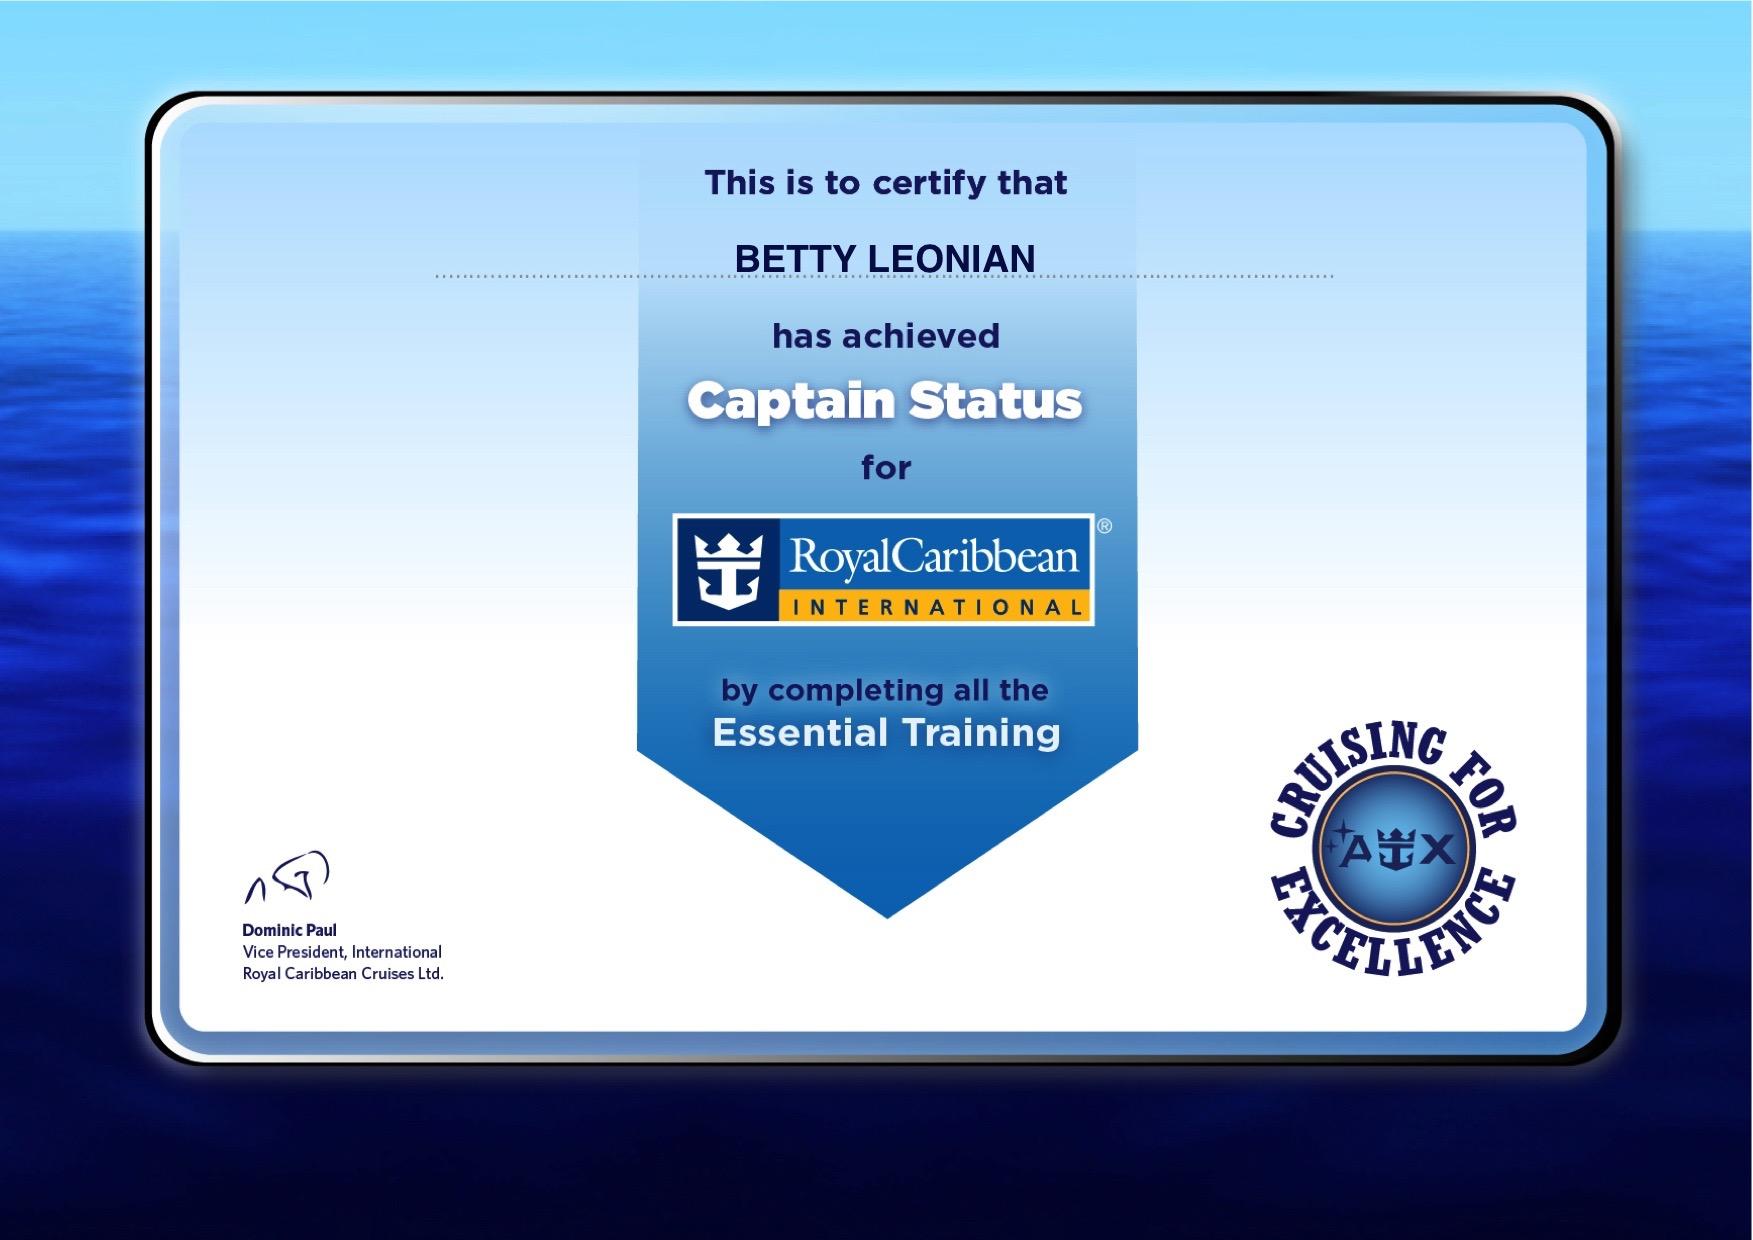 RCCL Certificate.jpg